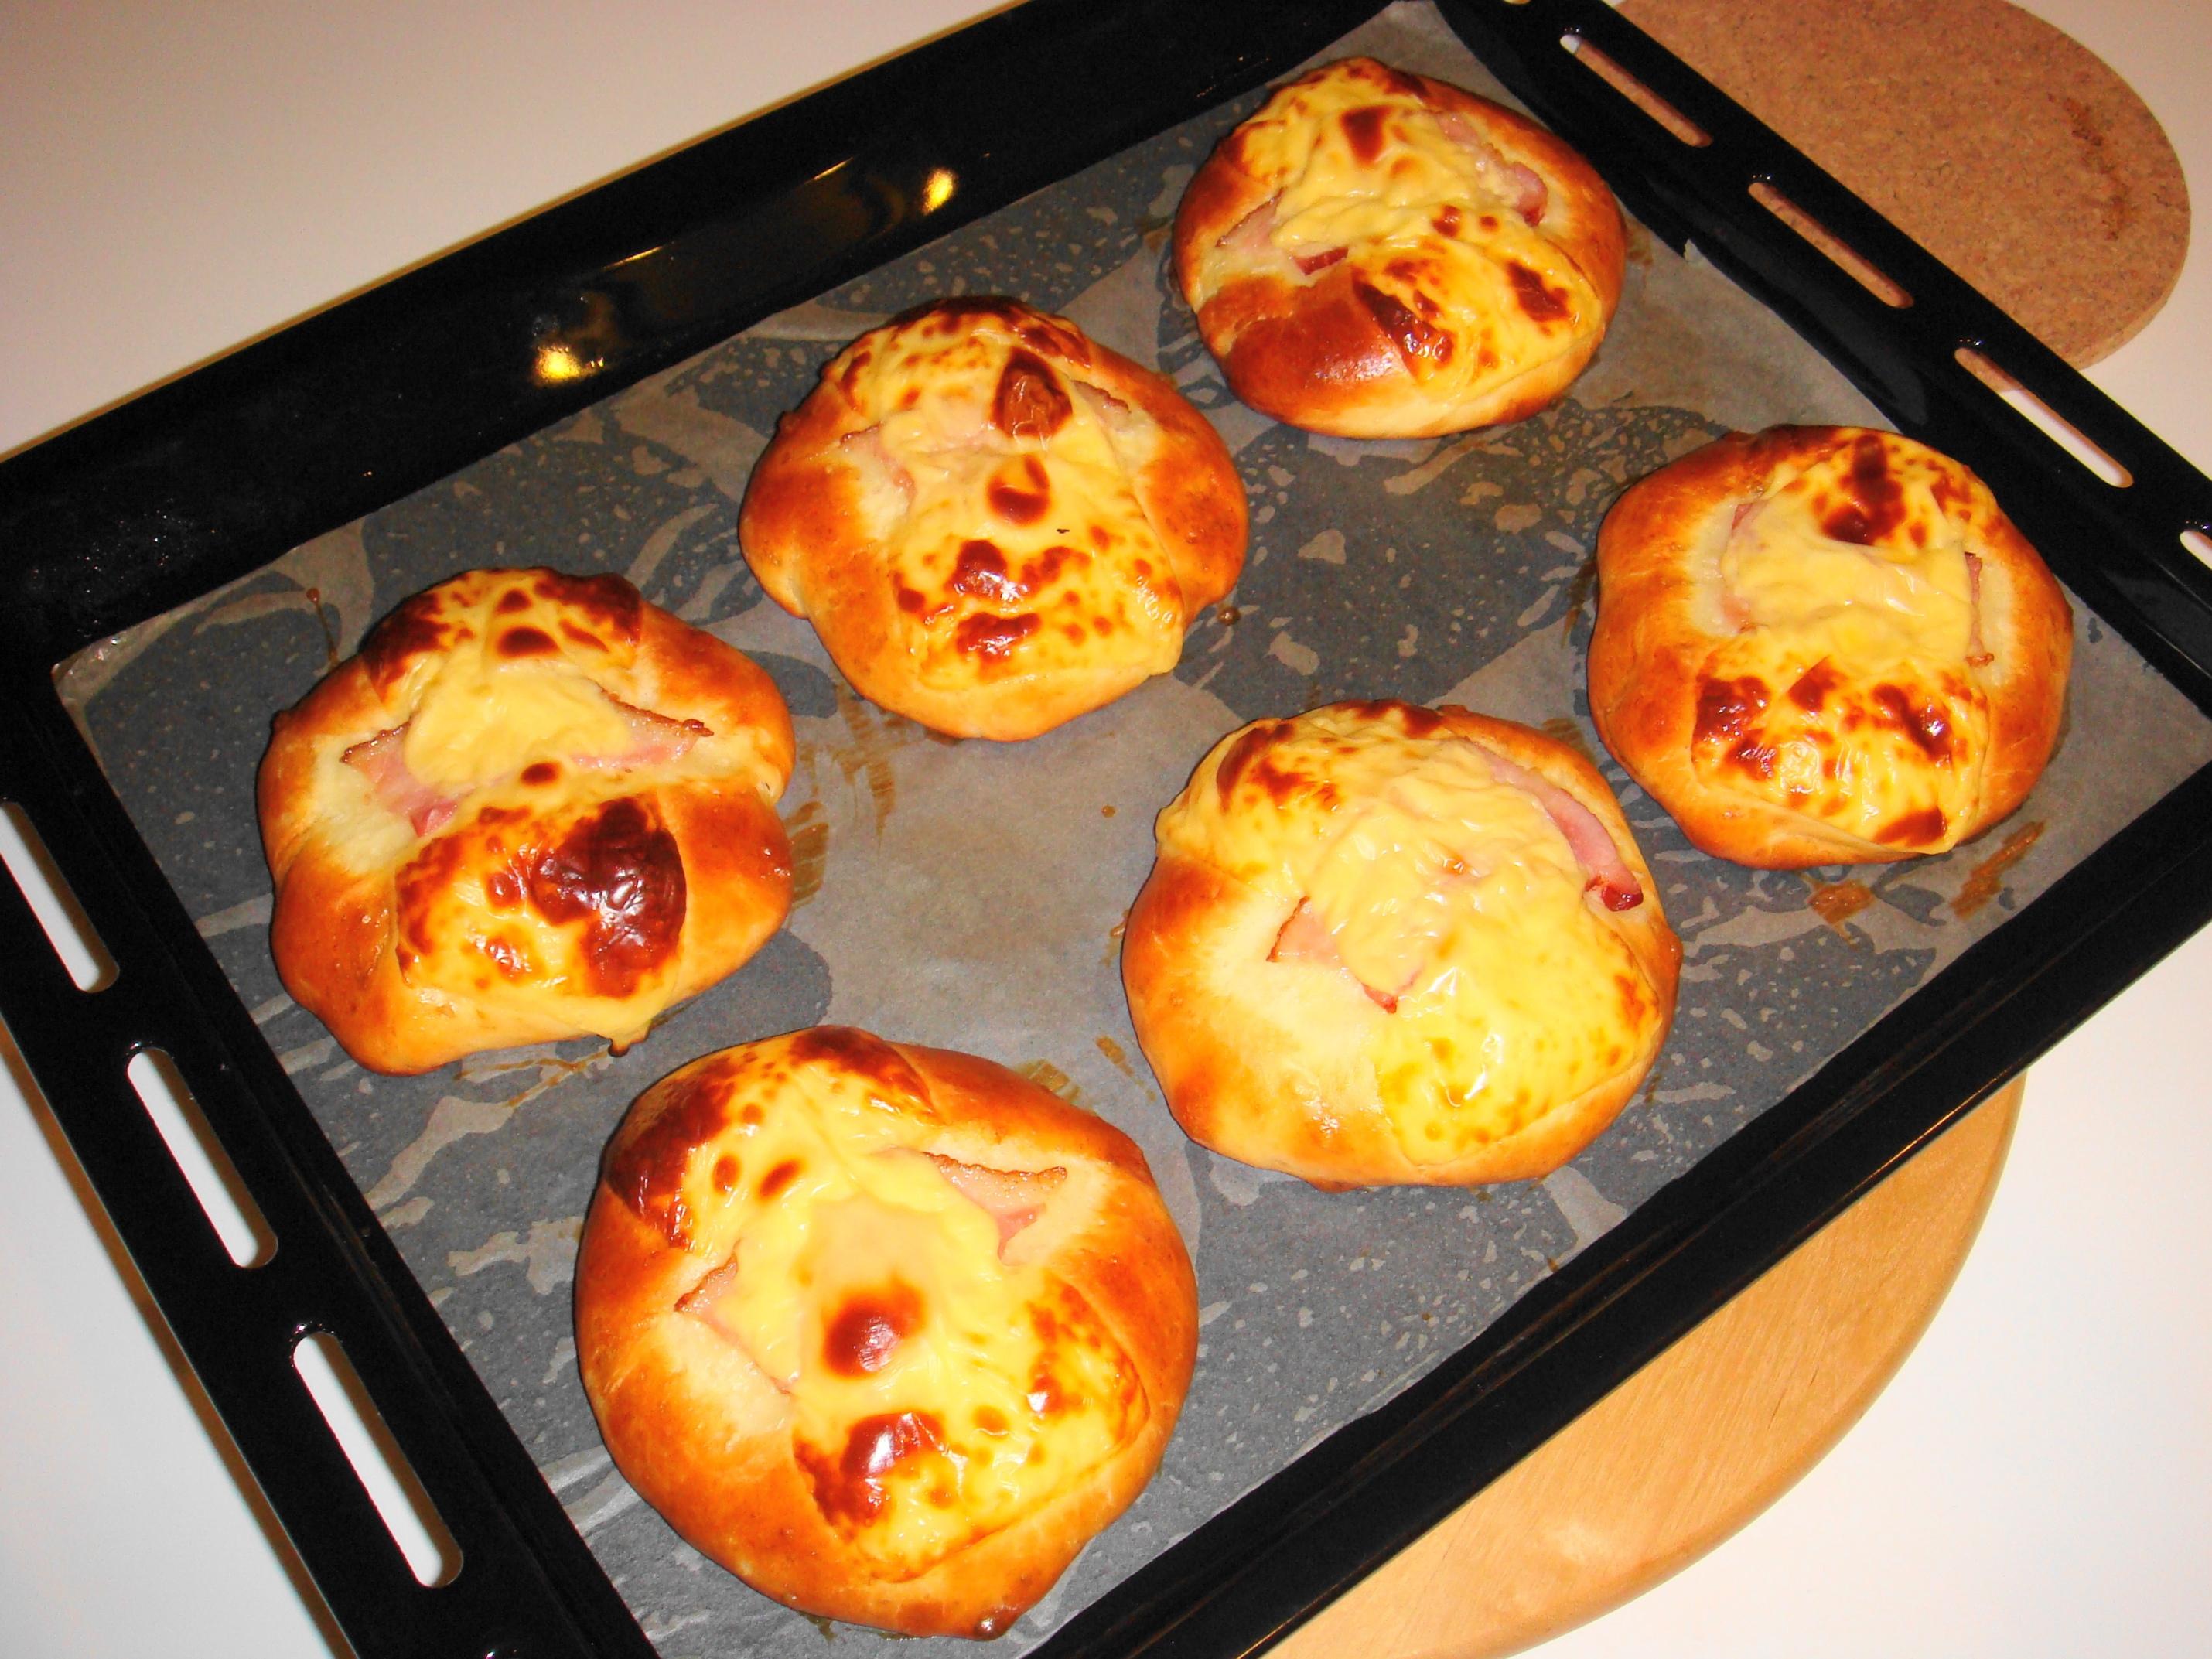 Freshly baked buns… yummy!